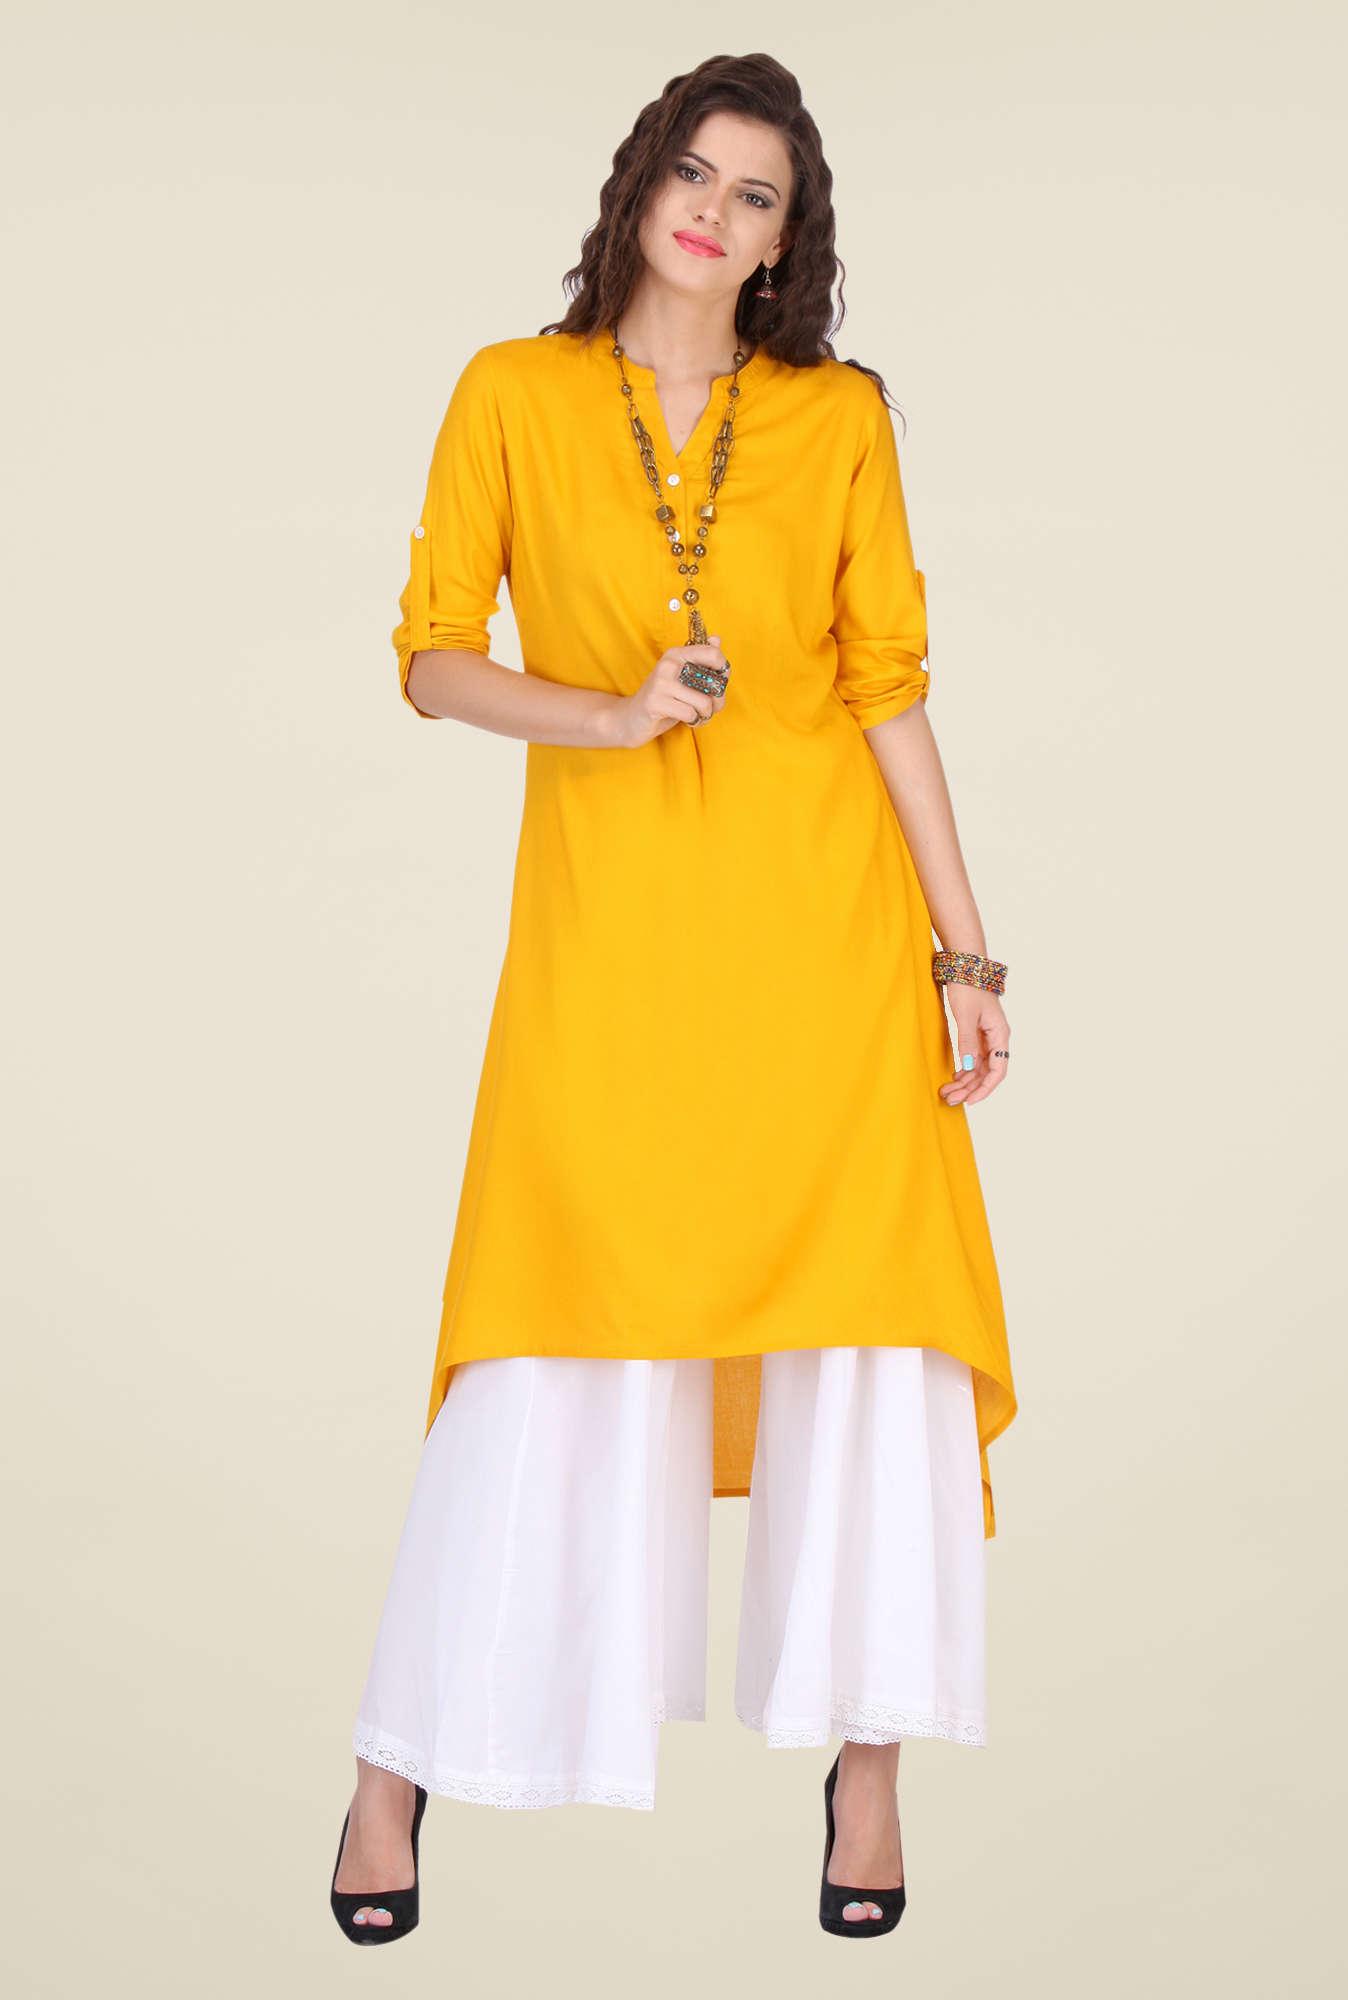 Varanga Women Clothing at Flat 70% OFF, Starts Rs.499 + Free Shipping discount offer